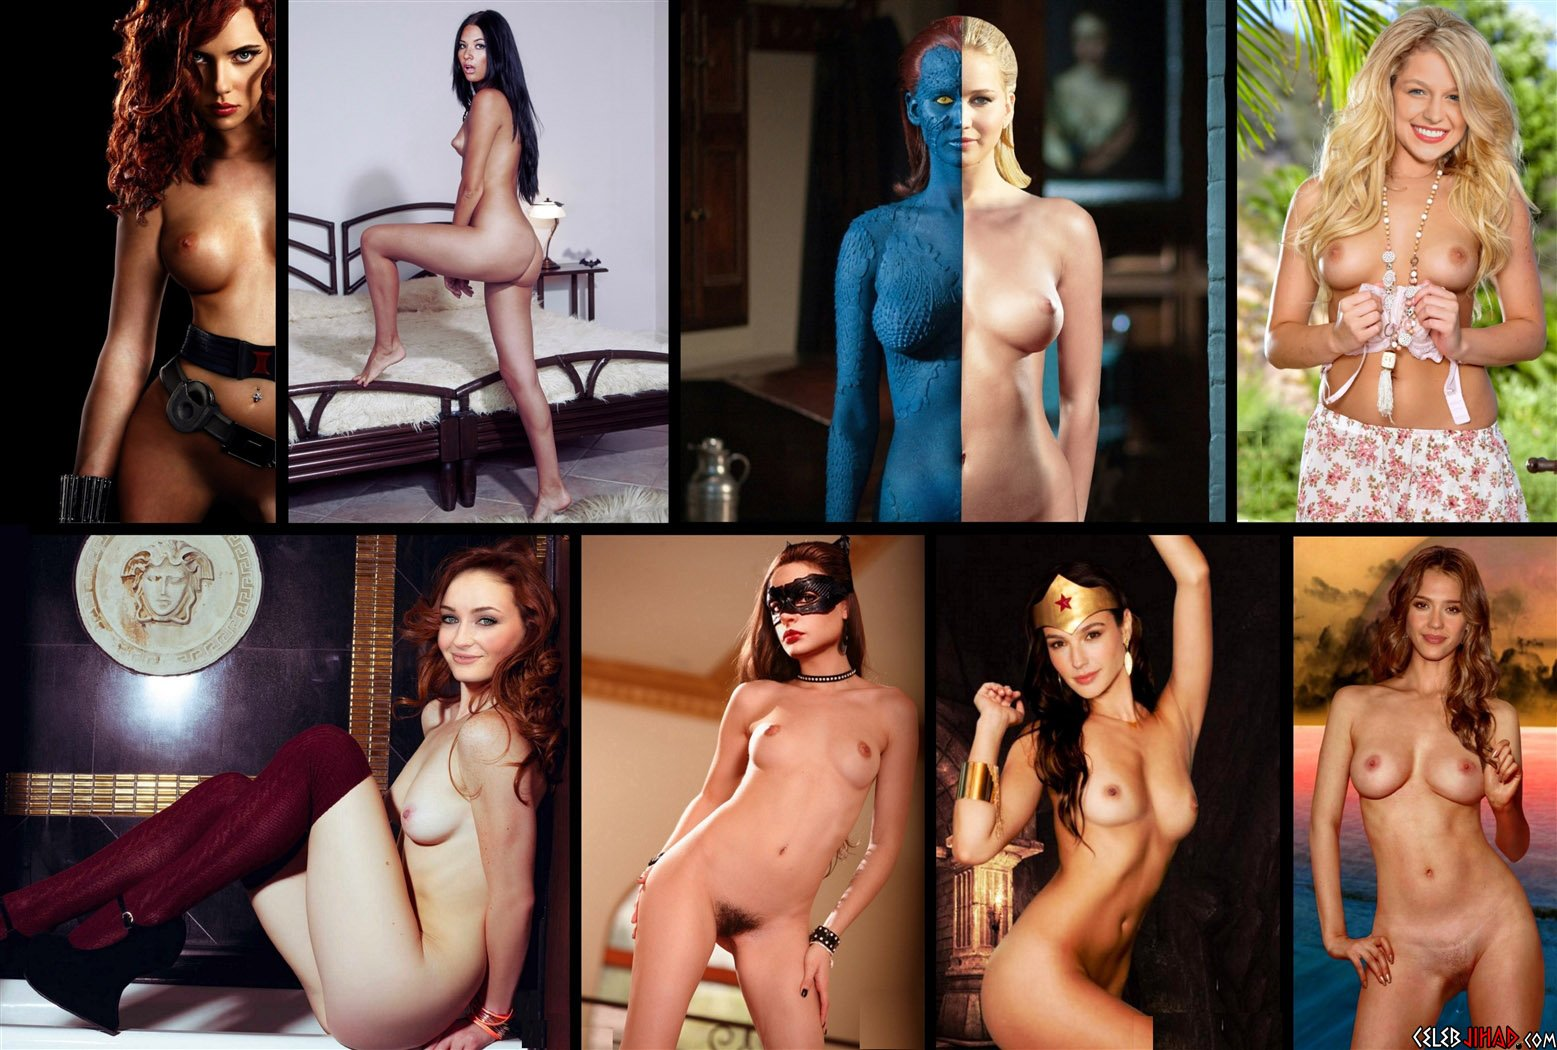 Seaxiest nude girls storyfree vedio